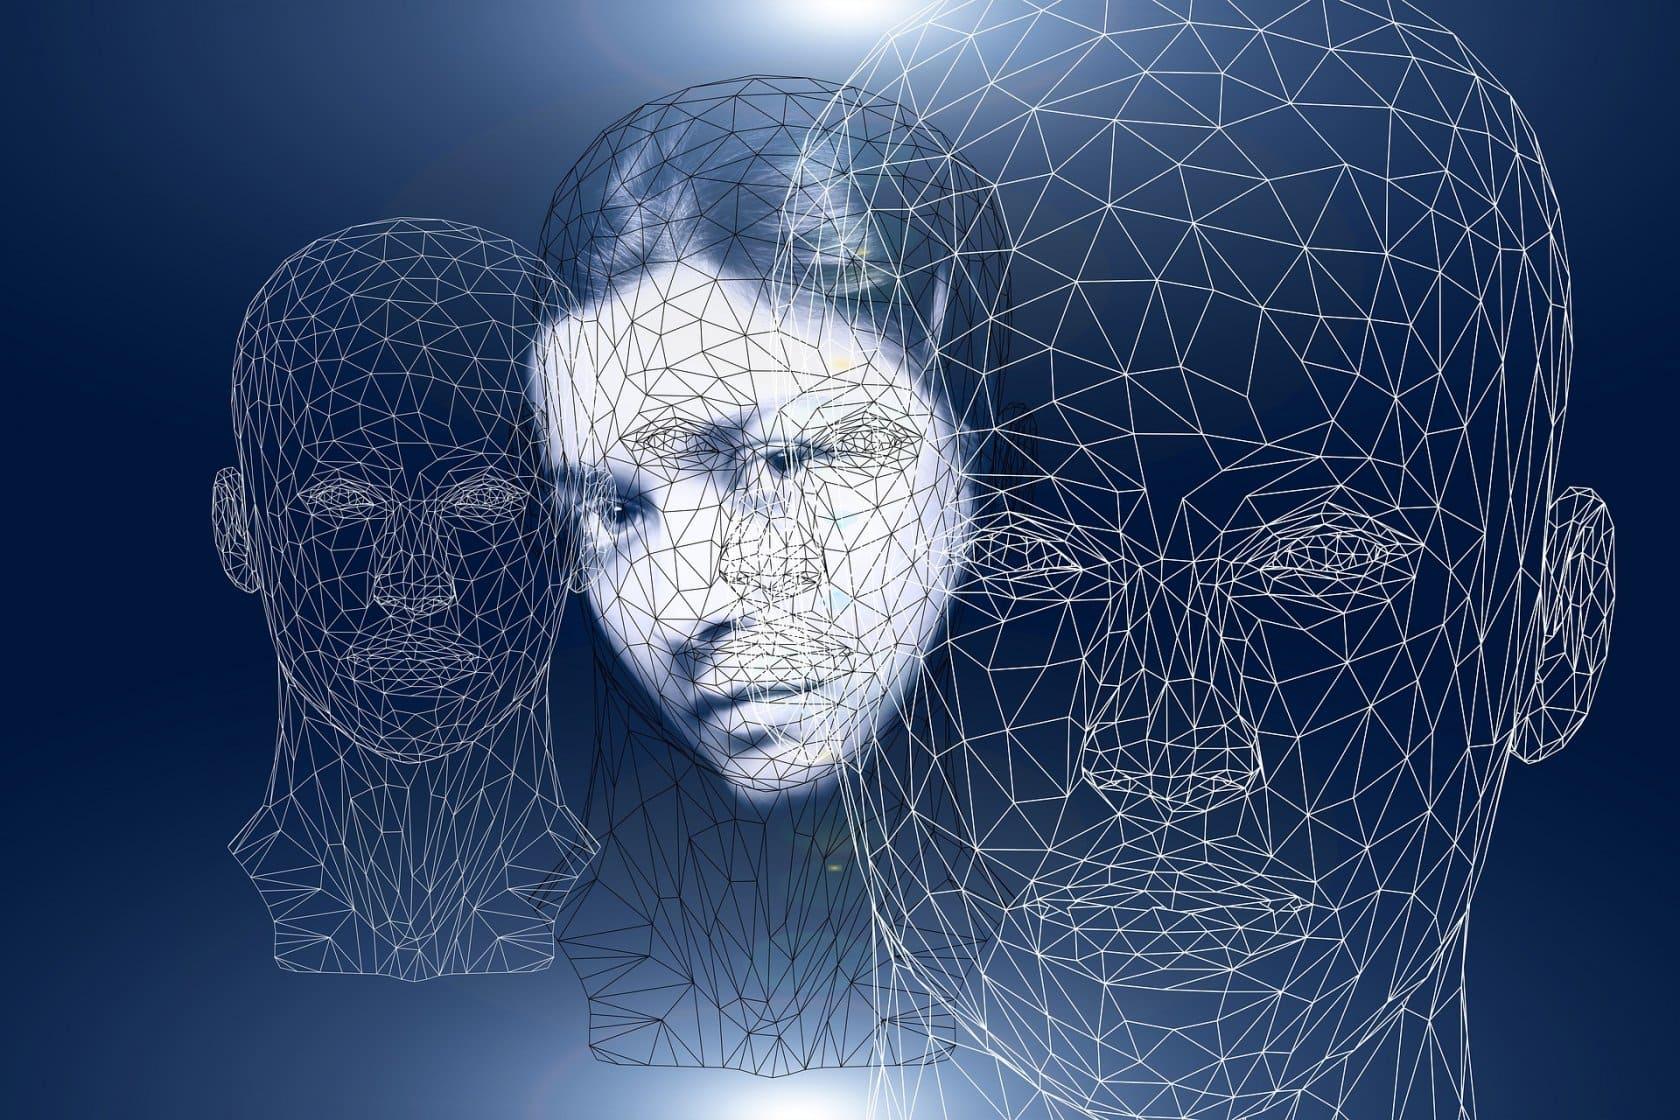 Картинки психологии человека